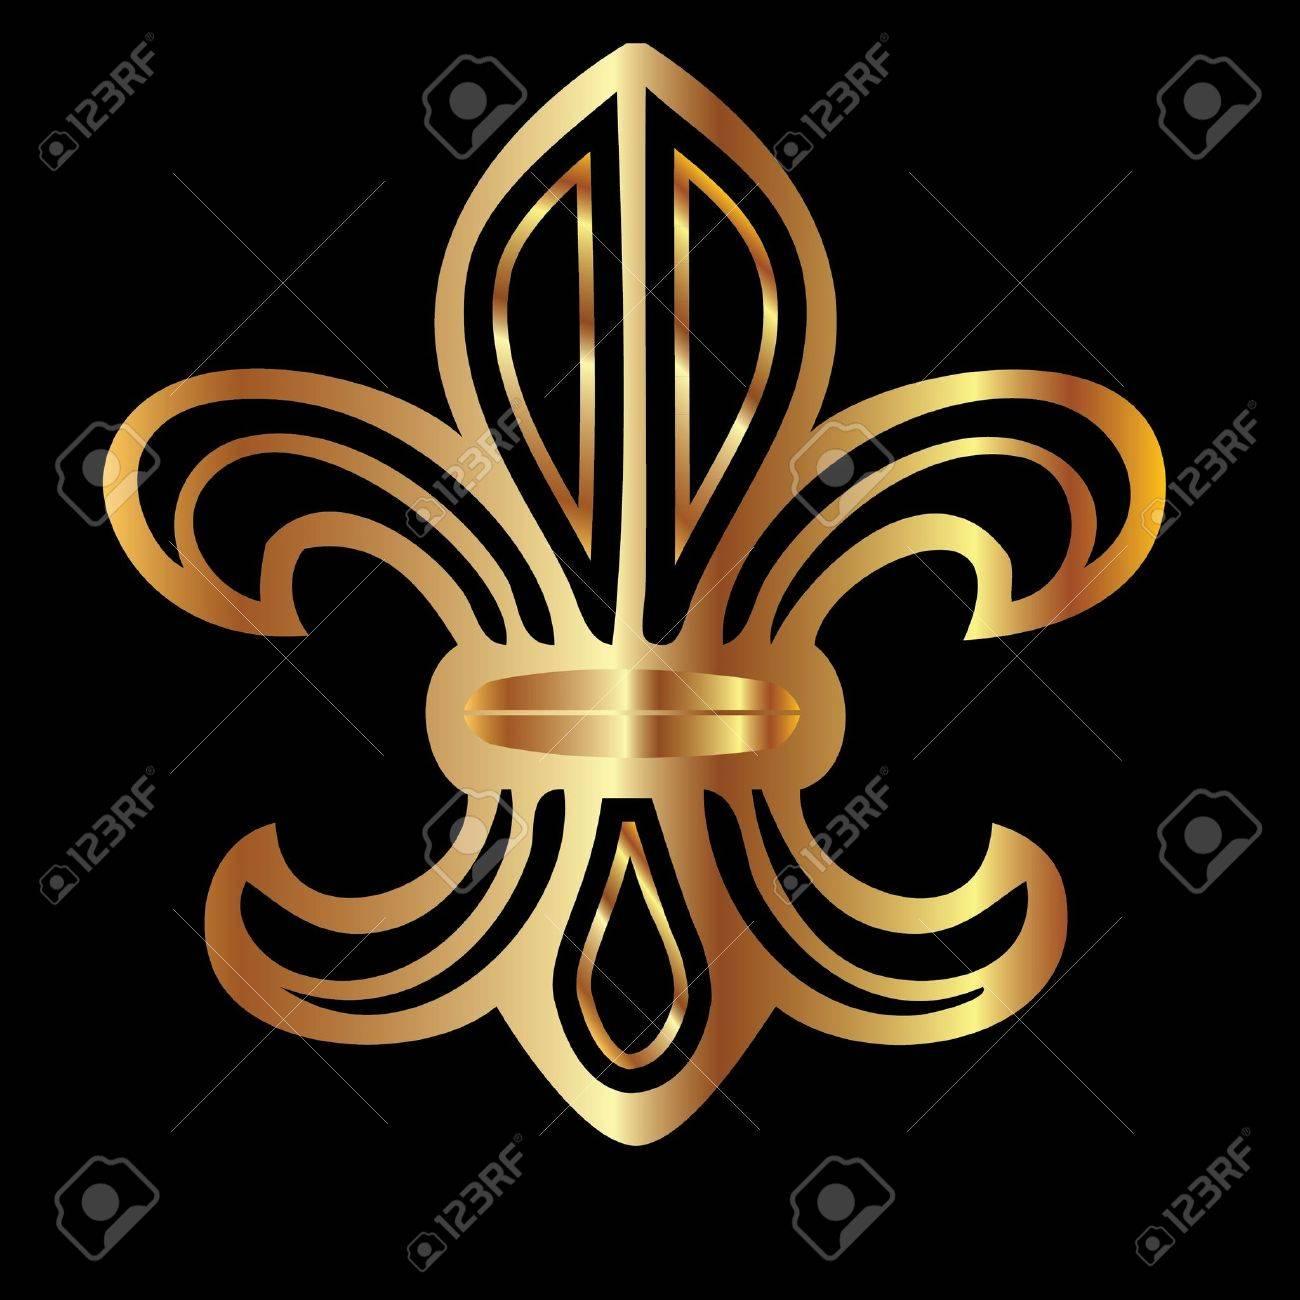 Golden glowing flour de lis symbol royalty free cliparts vectors golden glowing flour de lis symbol stock vector 10893600 biocorpaavc